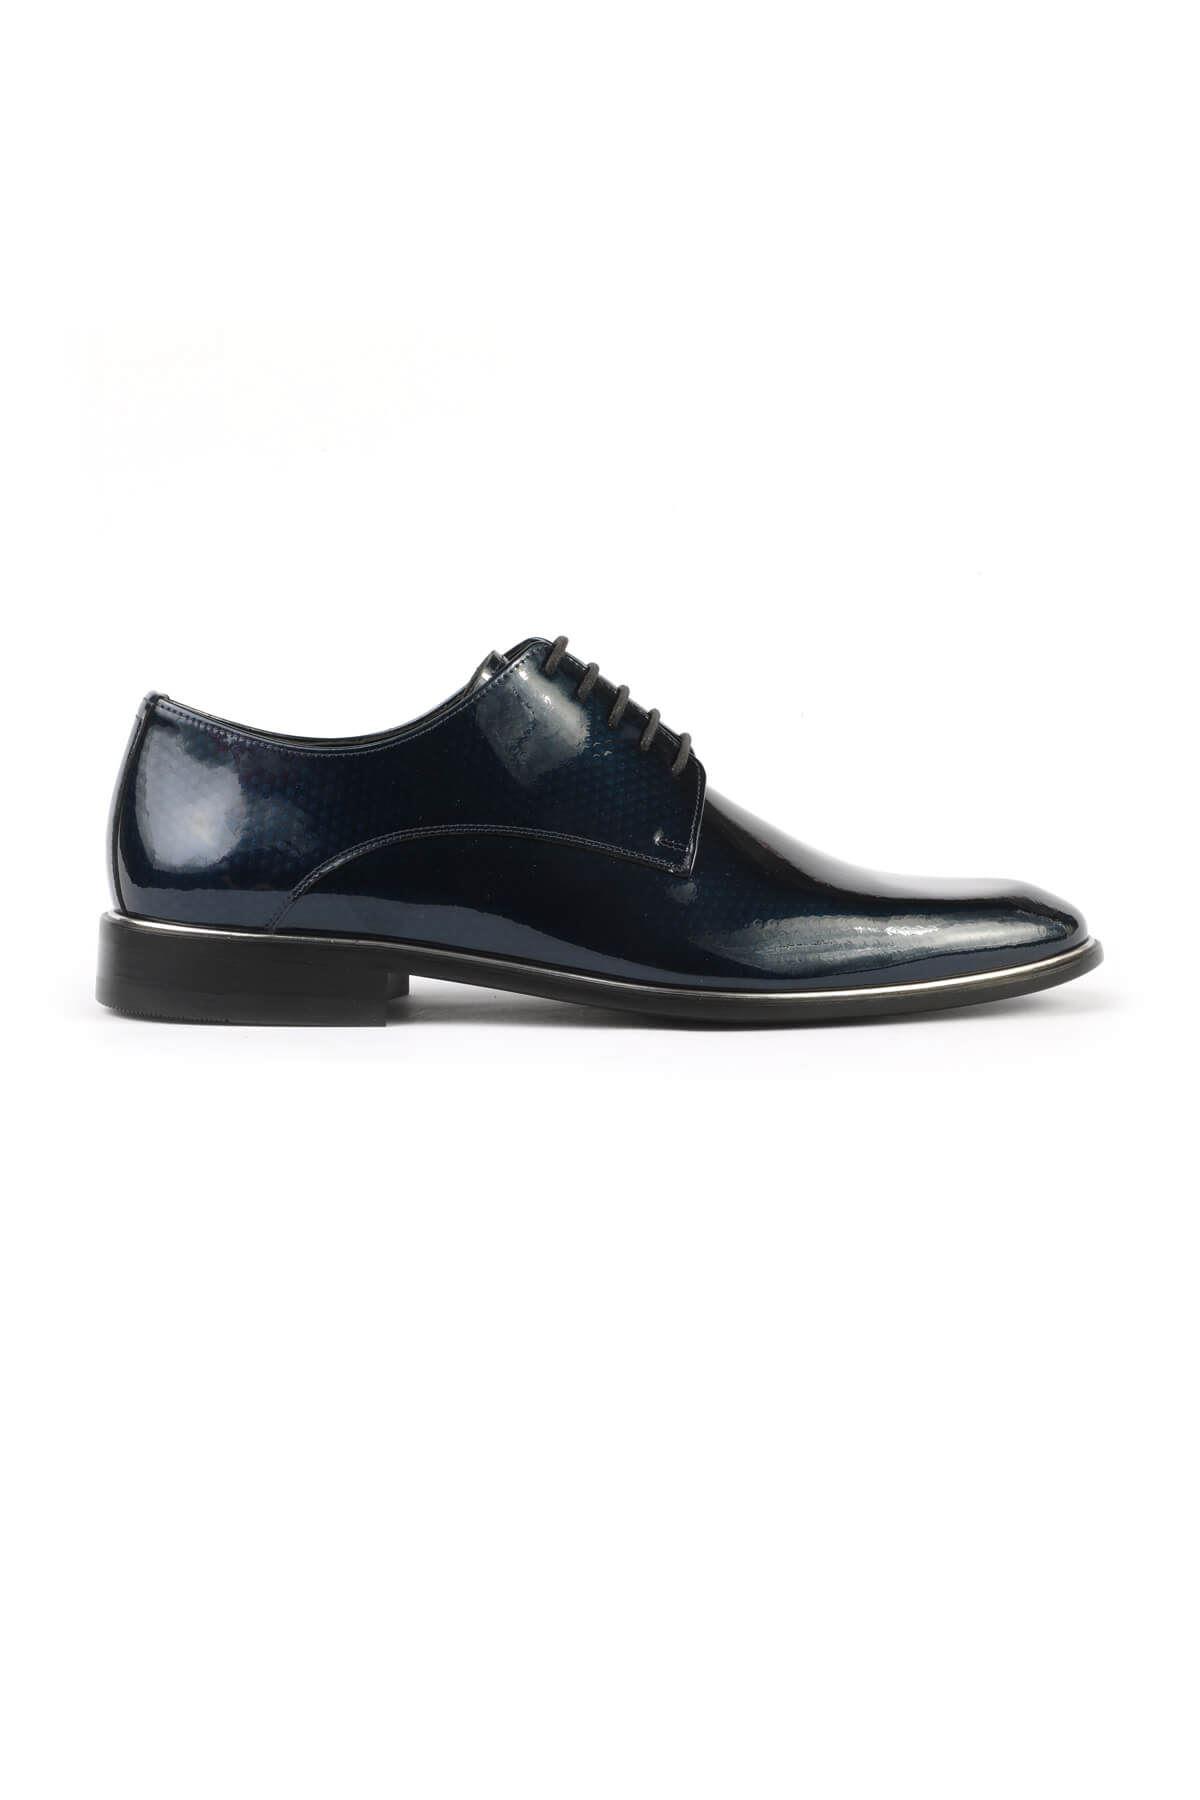 Libero 2140 Navy Blue Classic Shoes